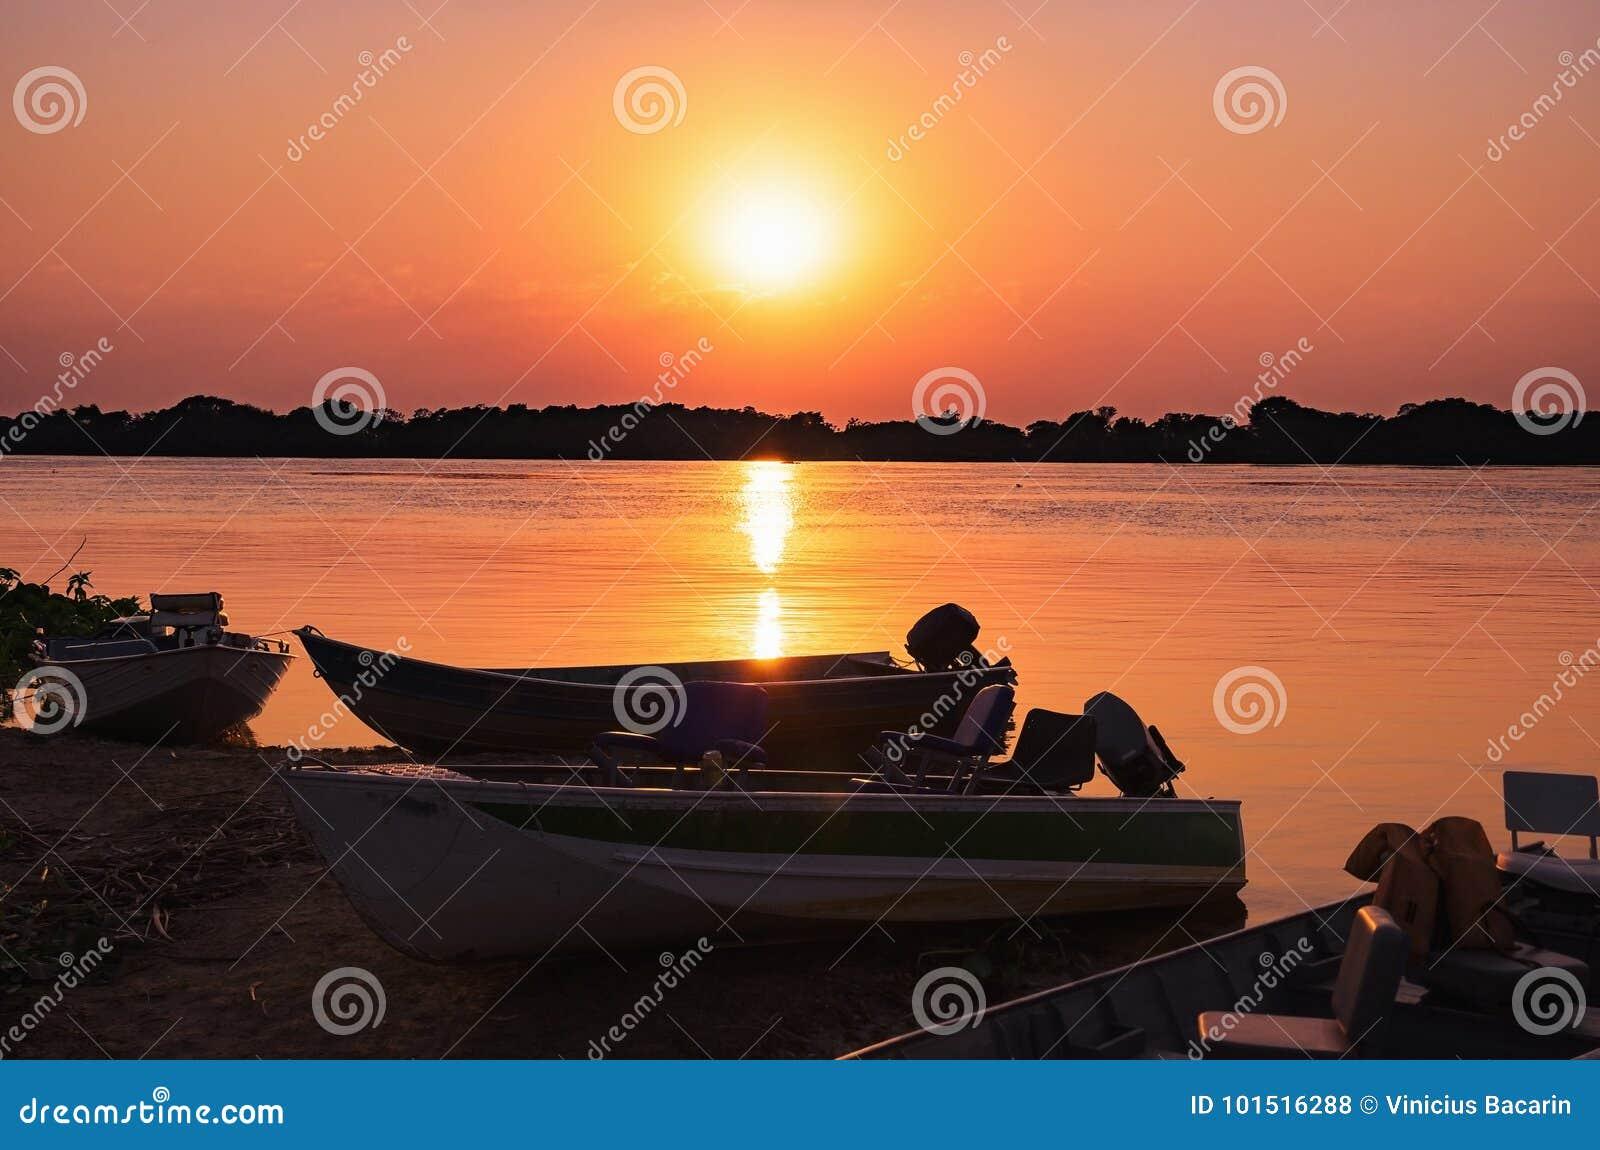 Paisaje maravilloso de una silueta de barcos en una puesta del sol asombrosa